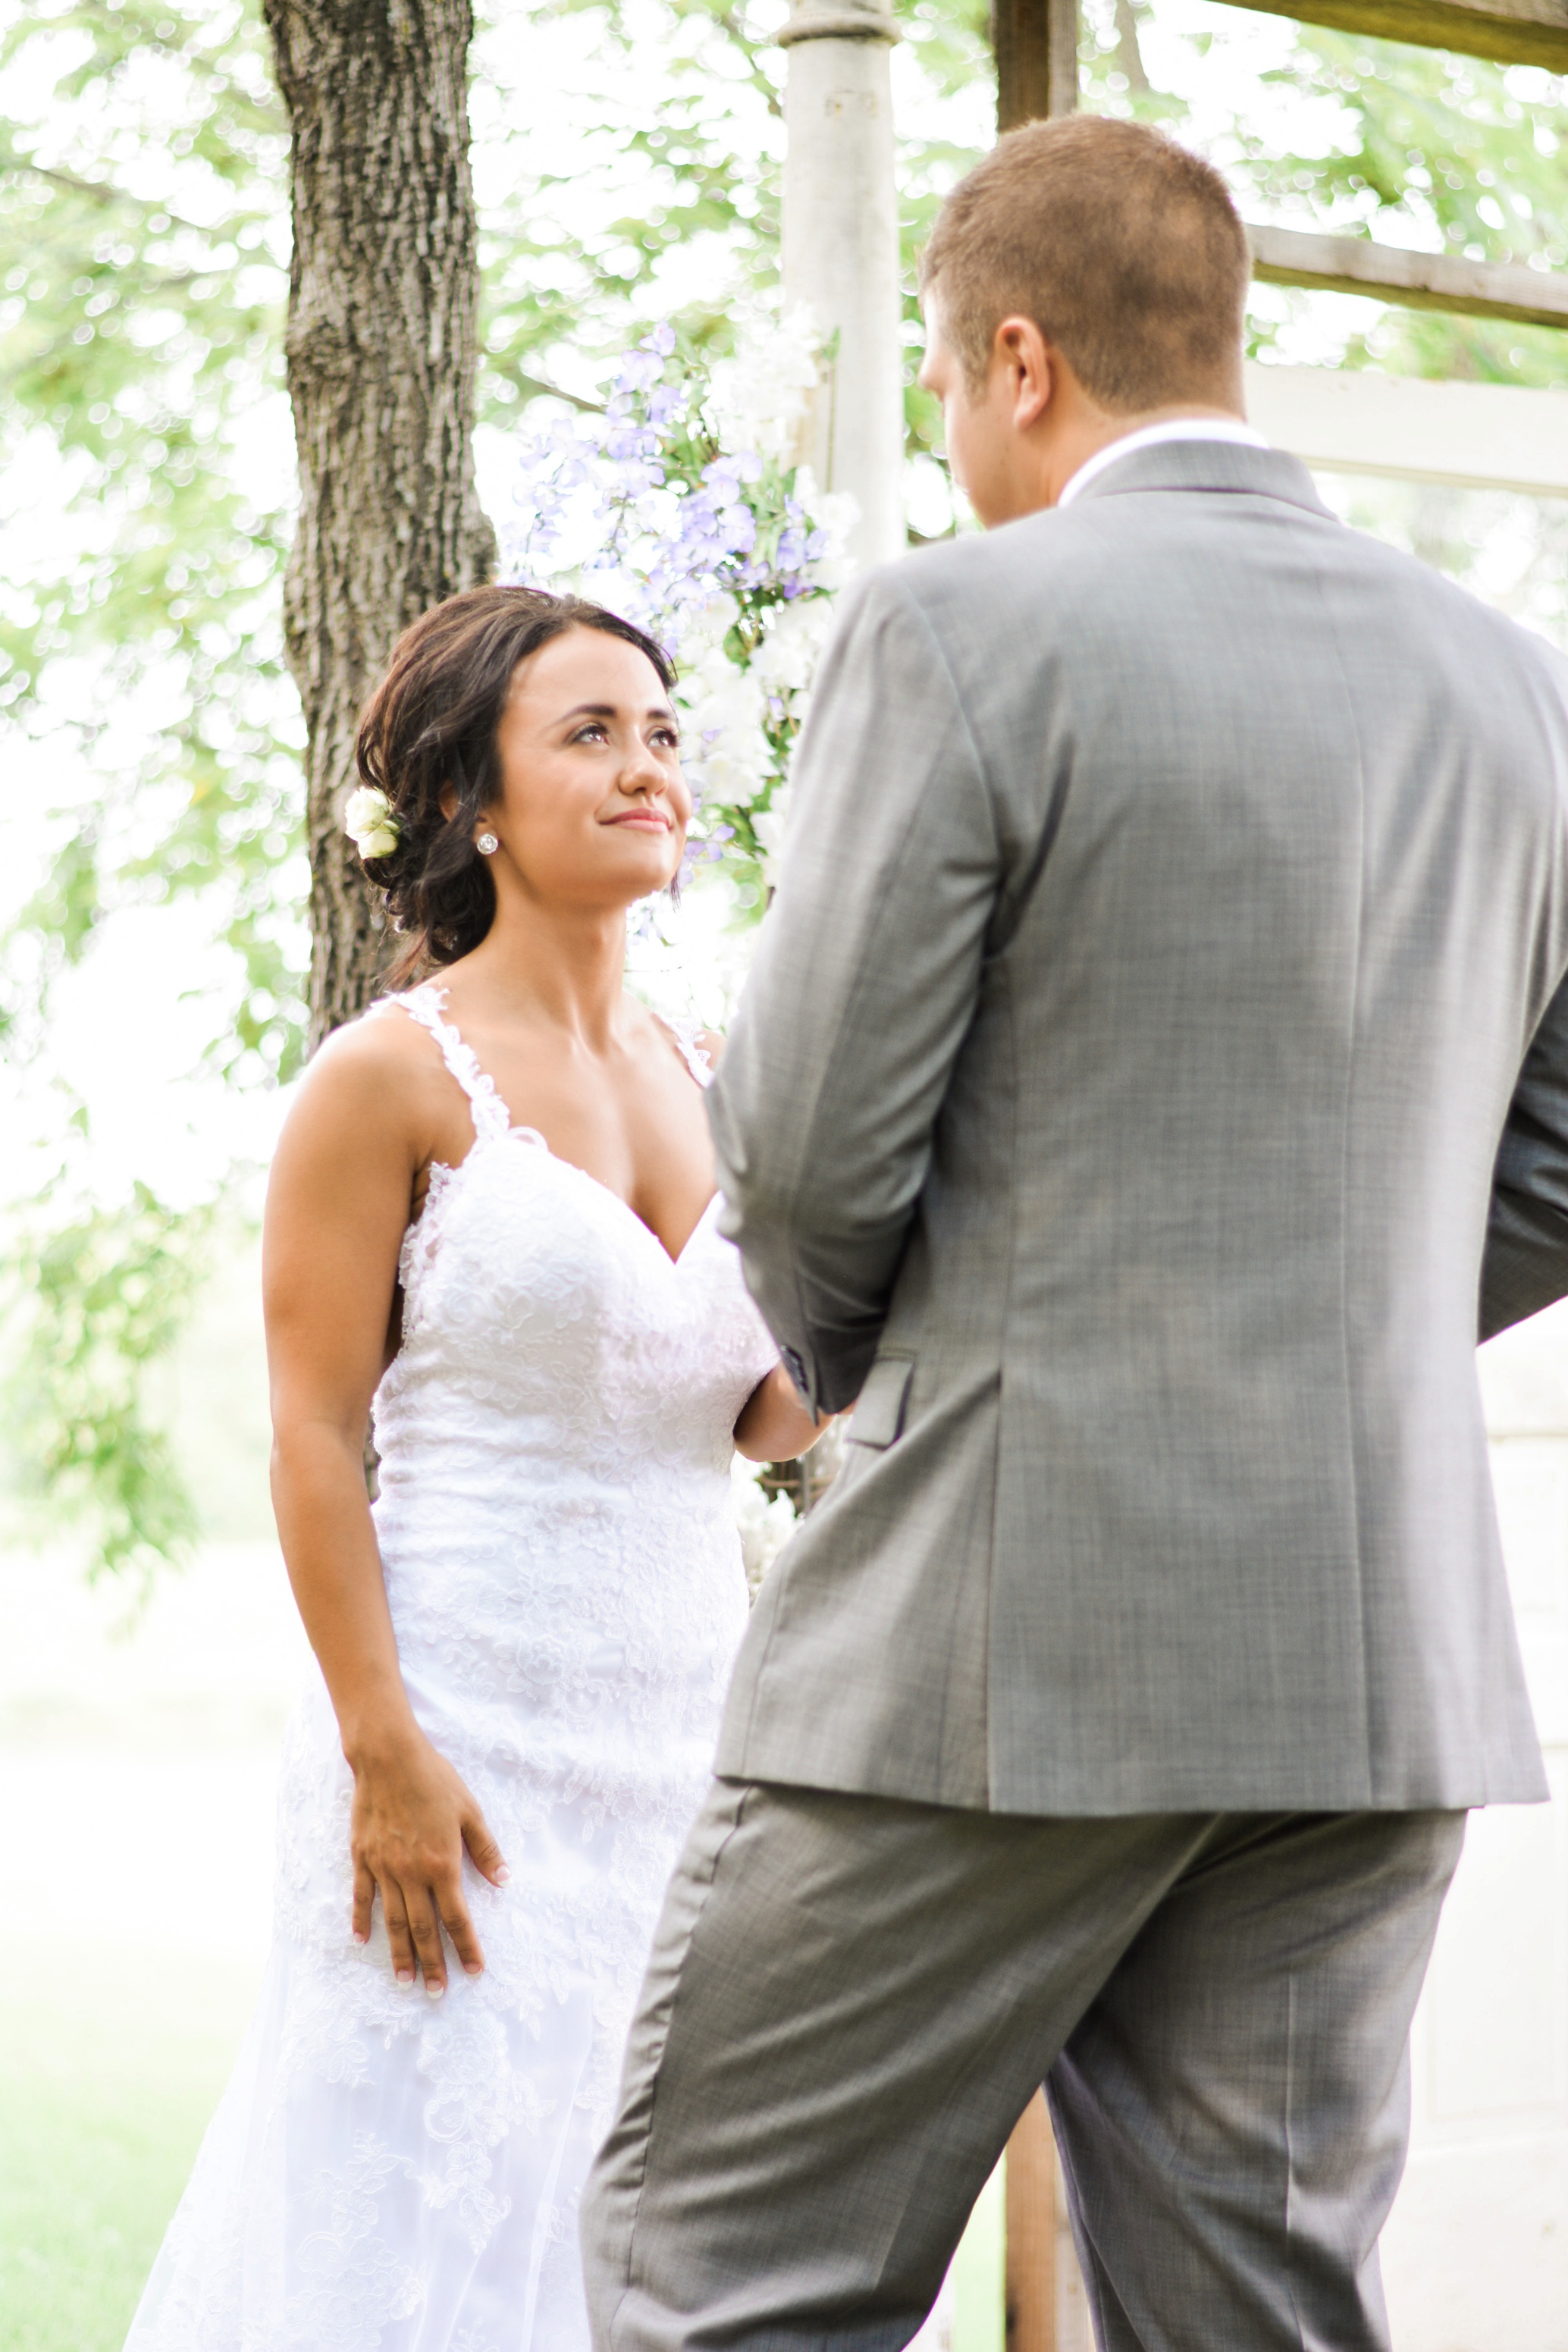 Barnes' Place Rustic Outdoor Wedding | Ali Leigh Photo Minneapolis Wedding Photographer_0114.jpg